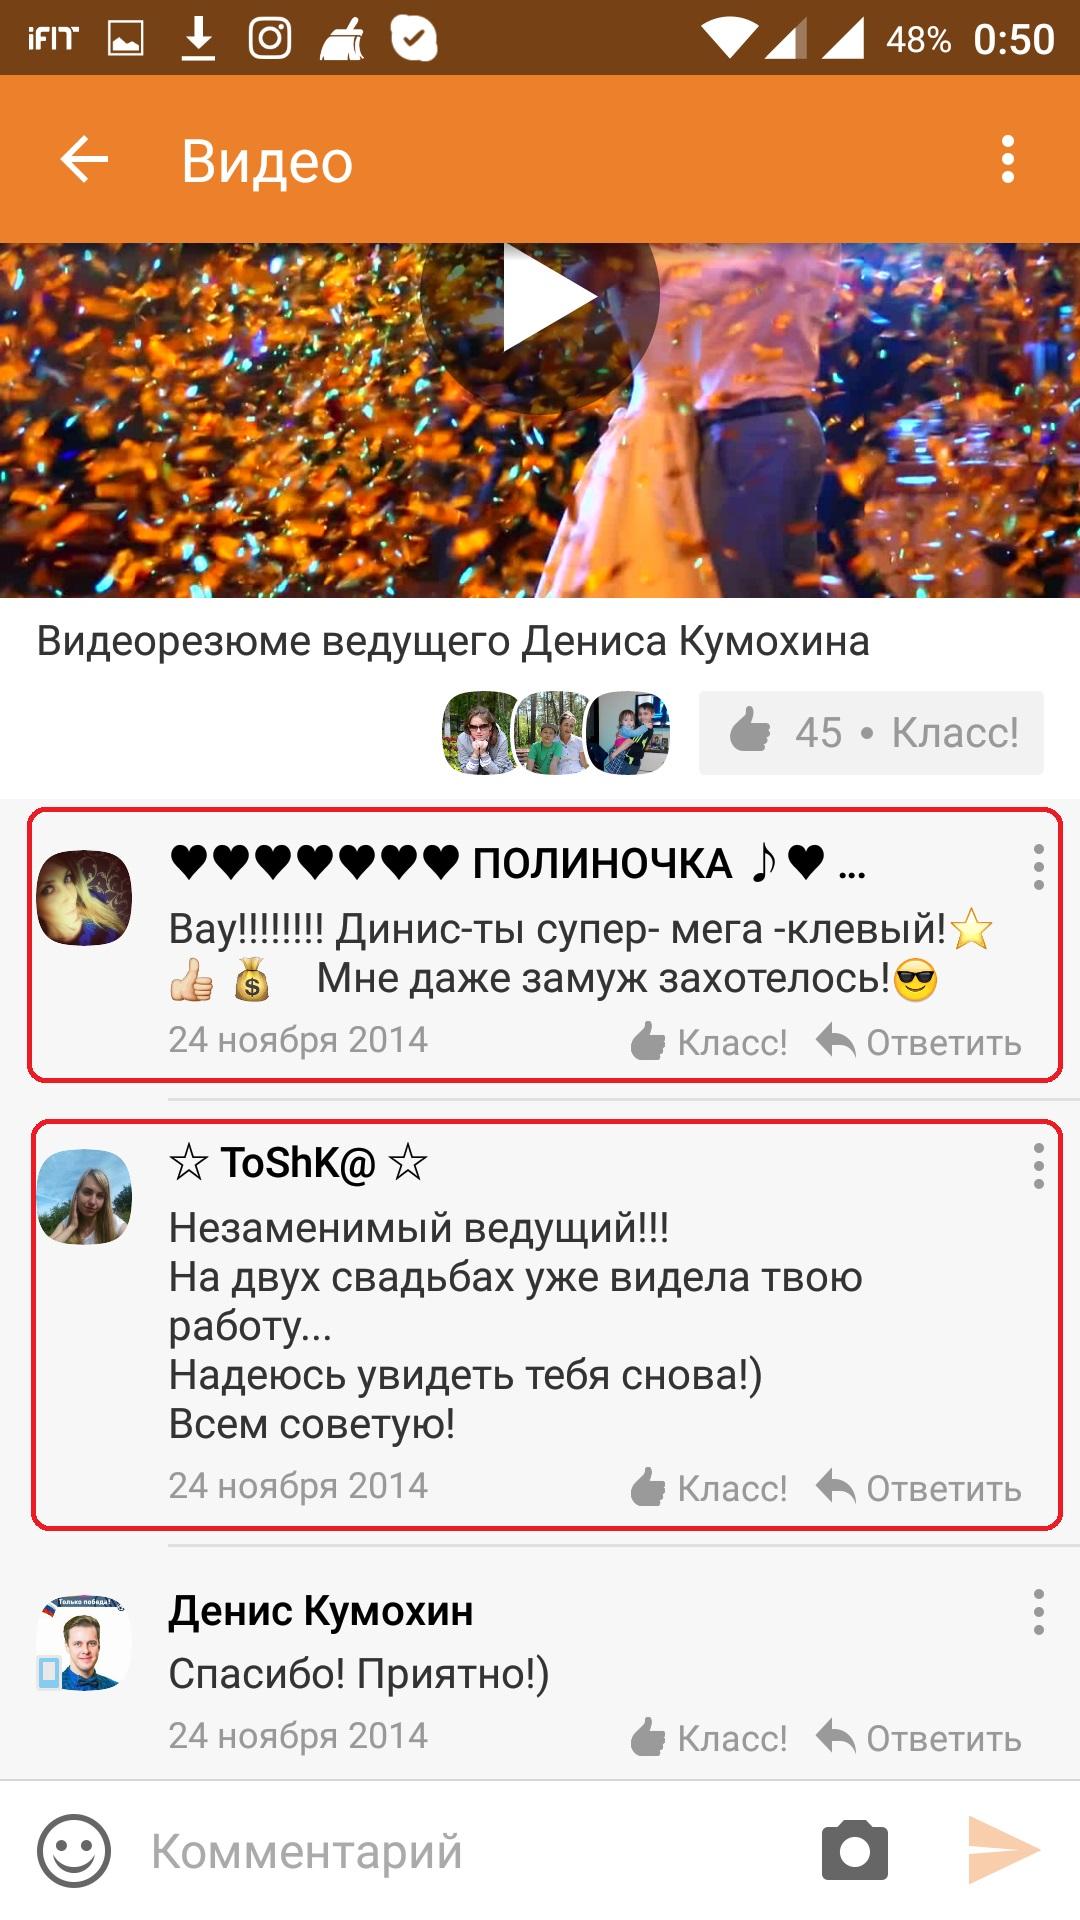 Денис Кумохин_отзыв